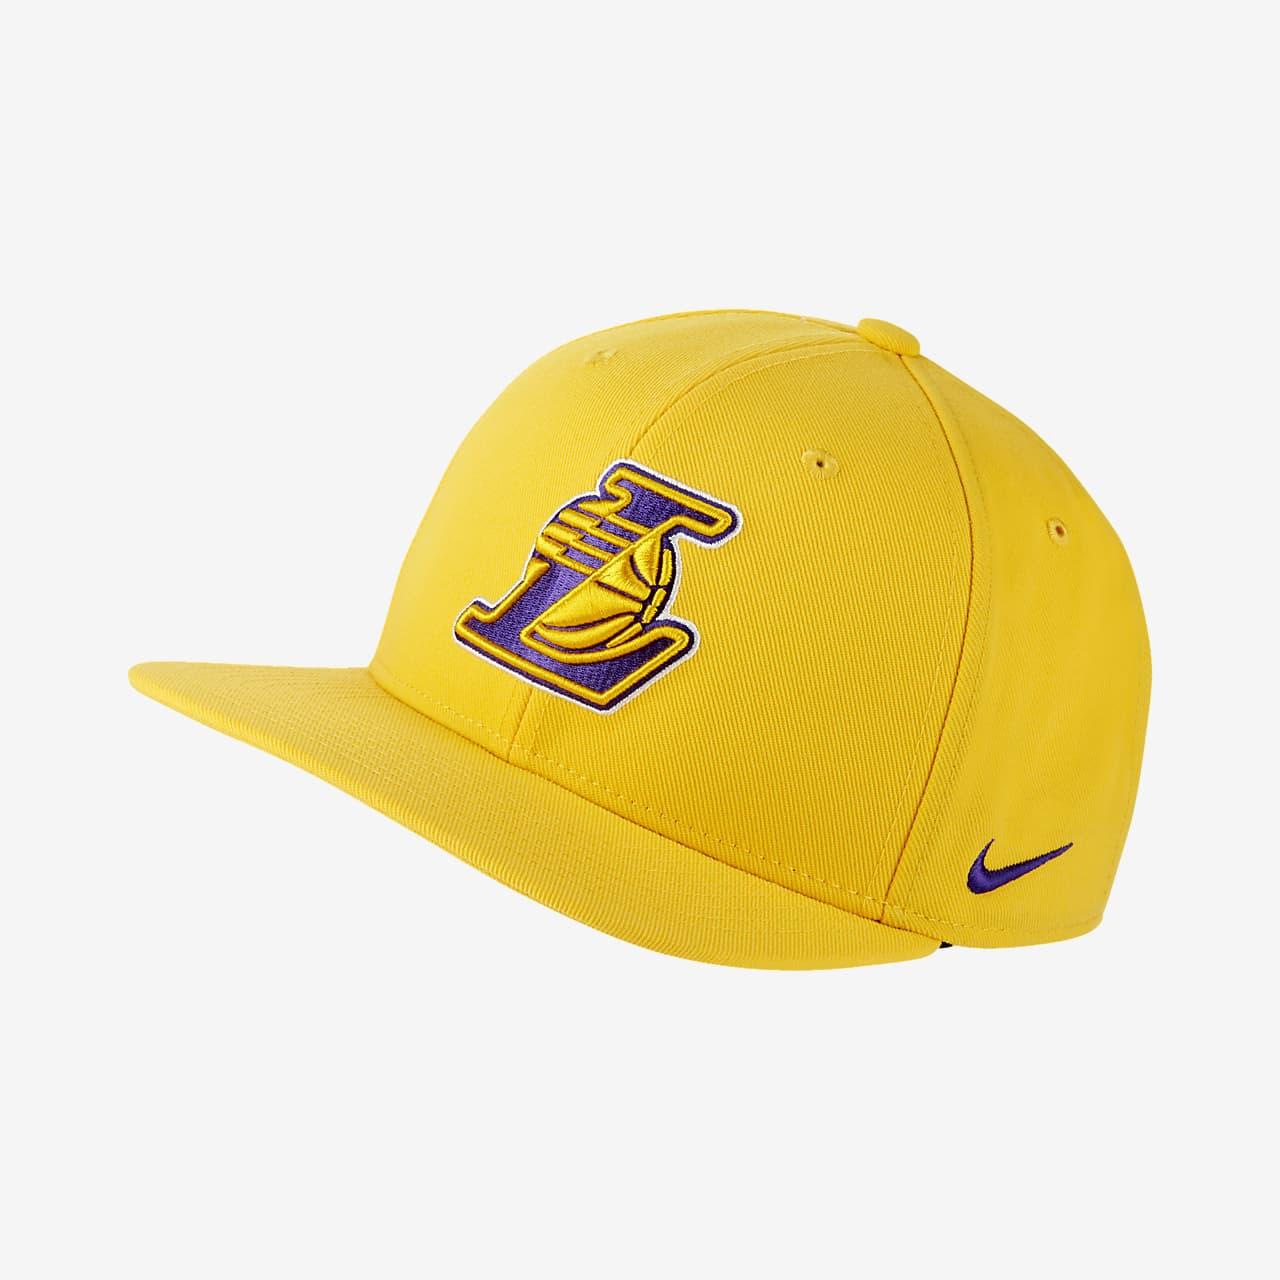 Los Angeles Lakers Nike Pro NBA-Cap